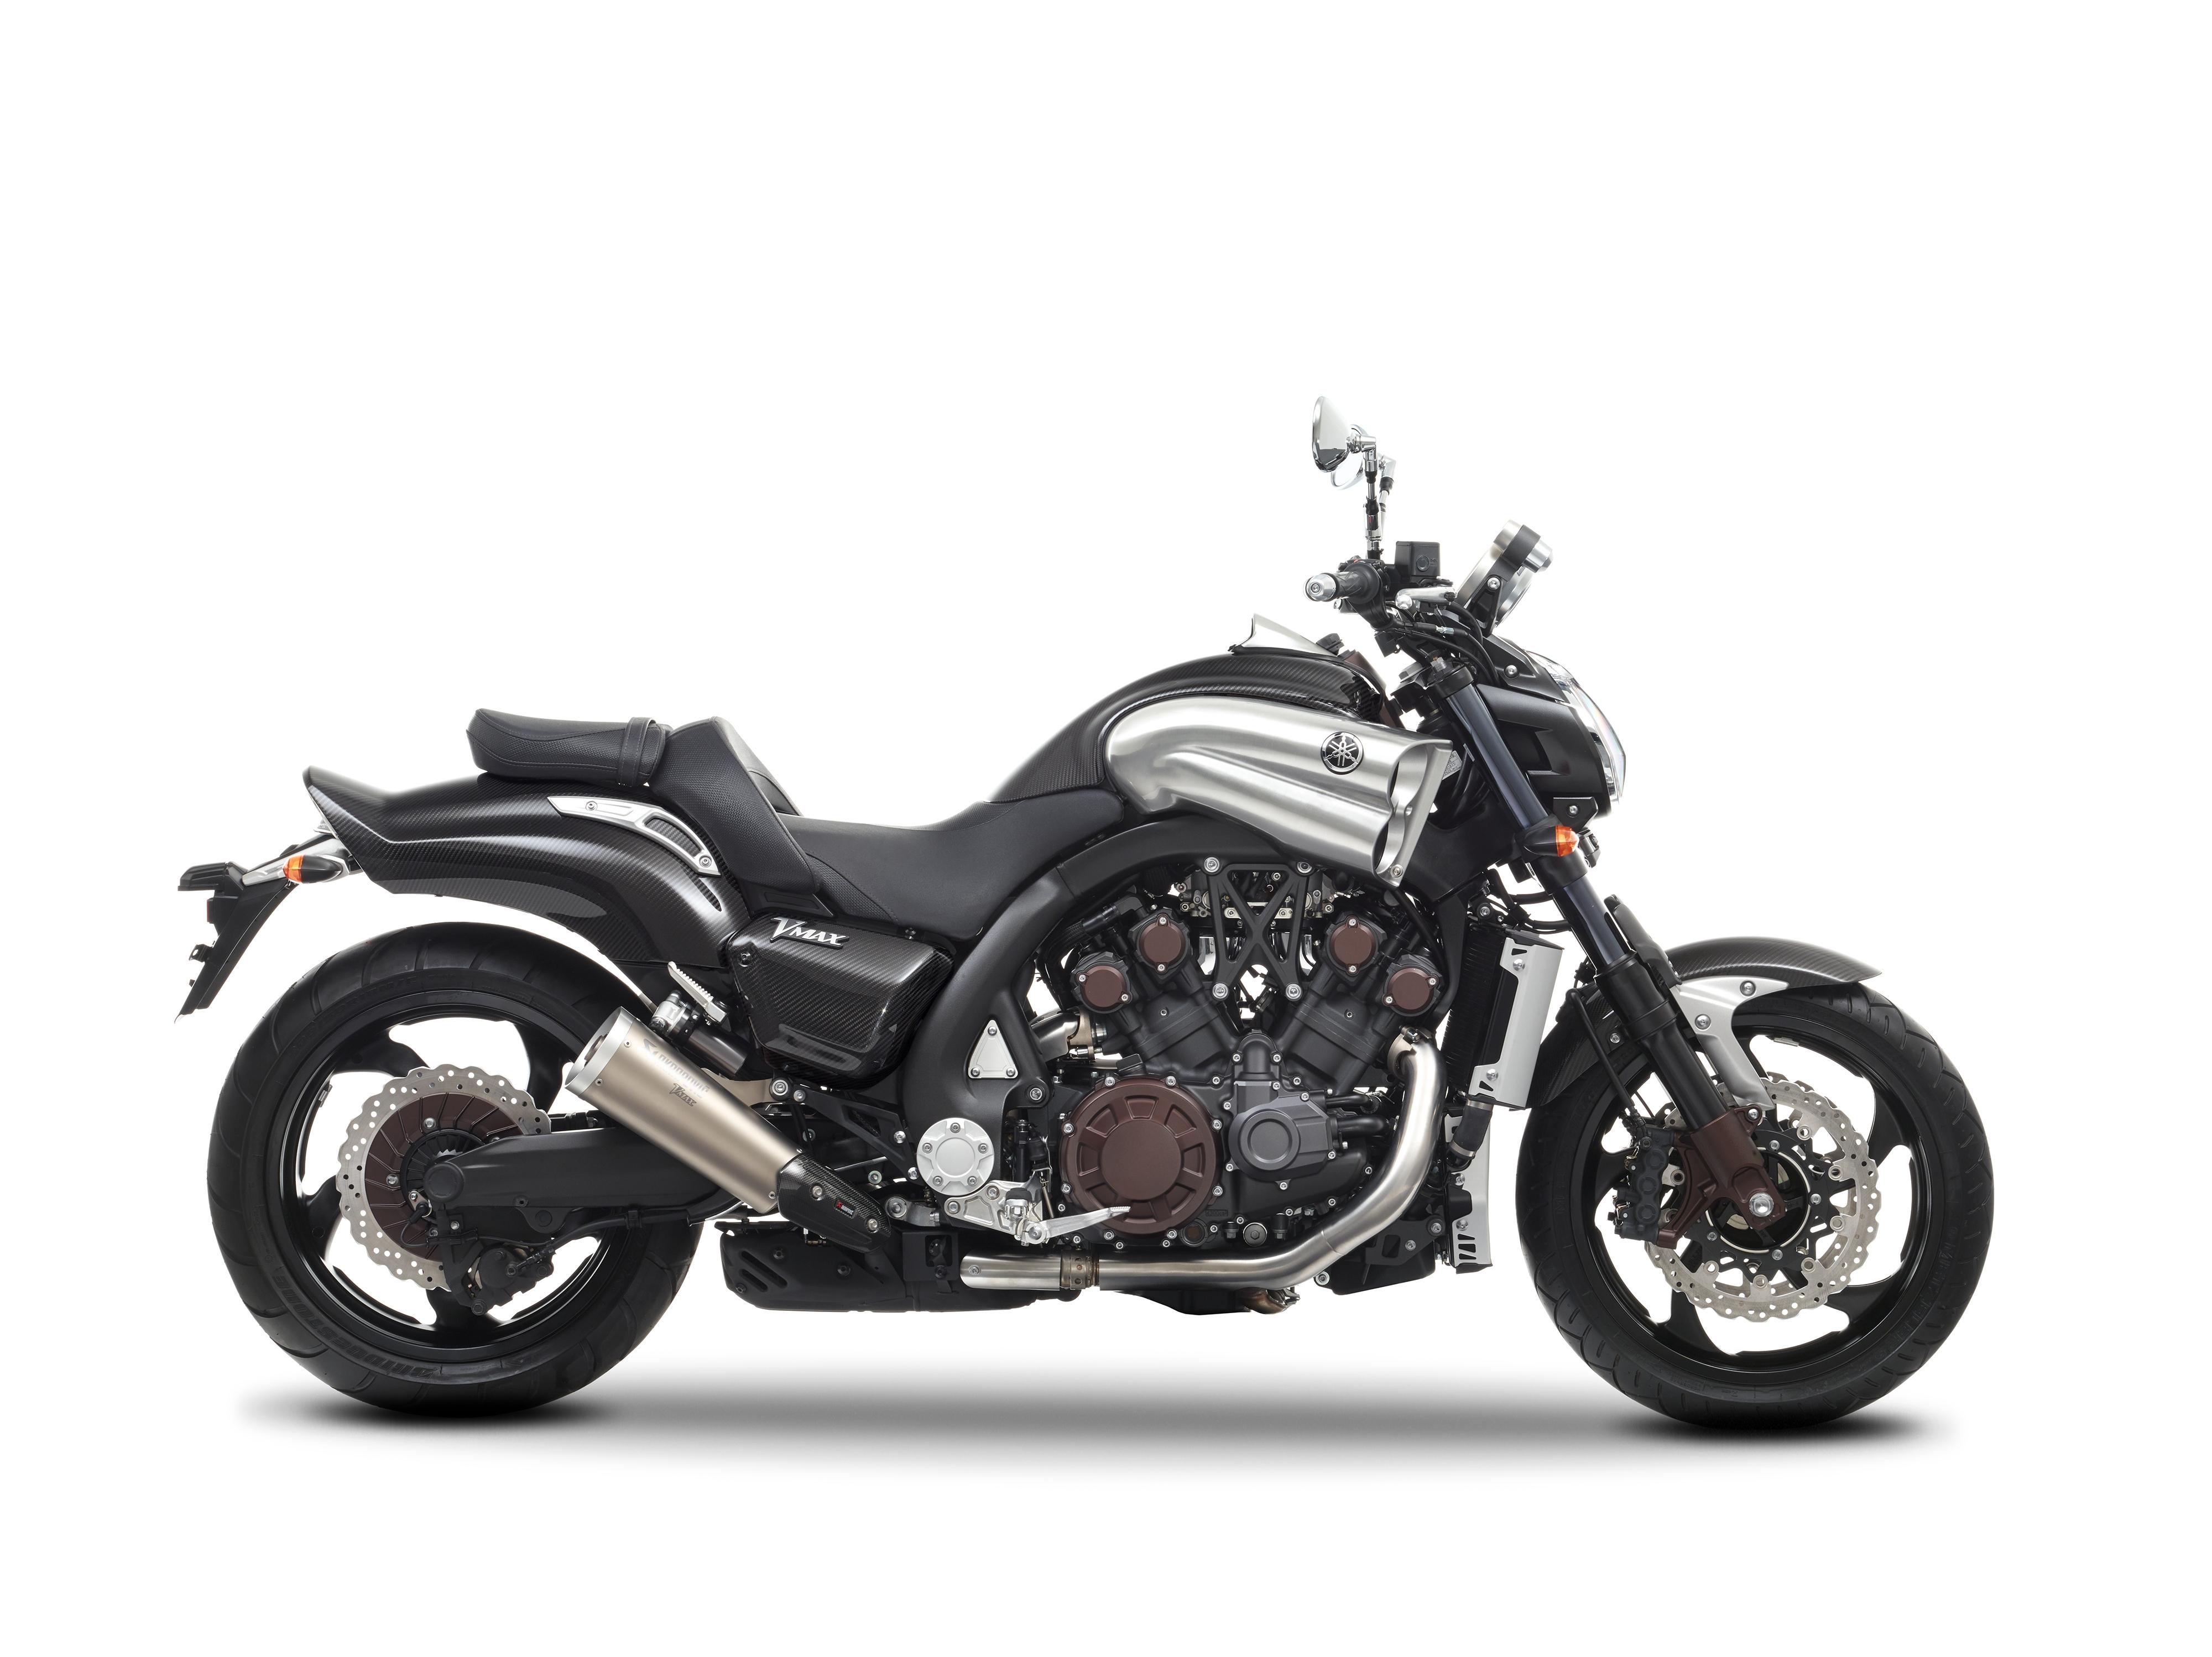 Yamaha reveals special edition VMAX Carbon